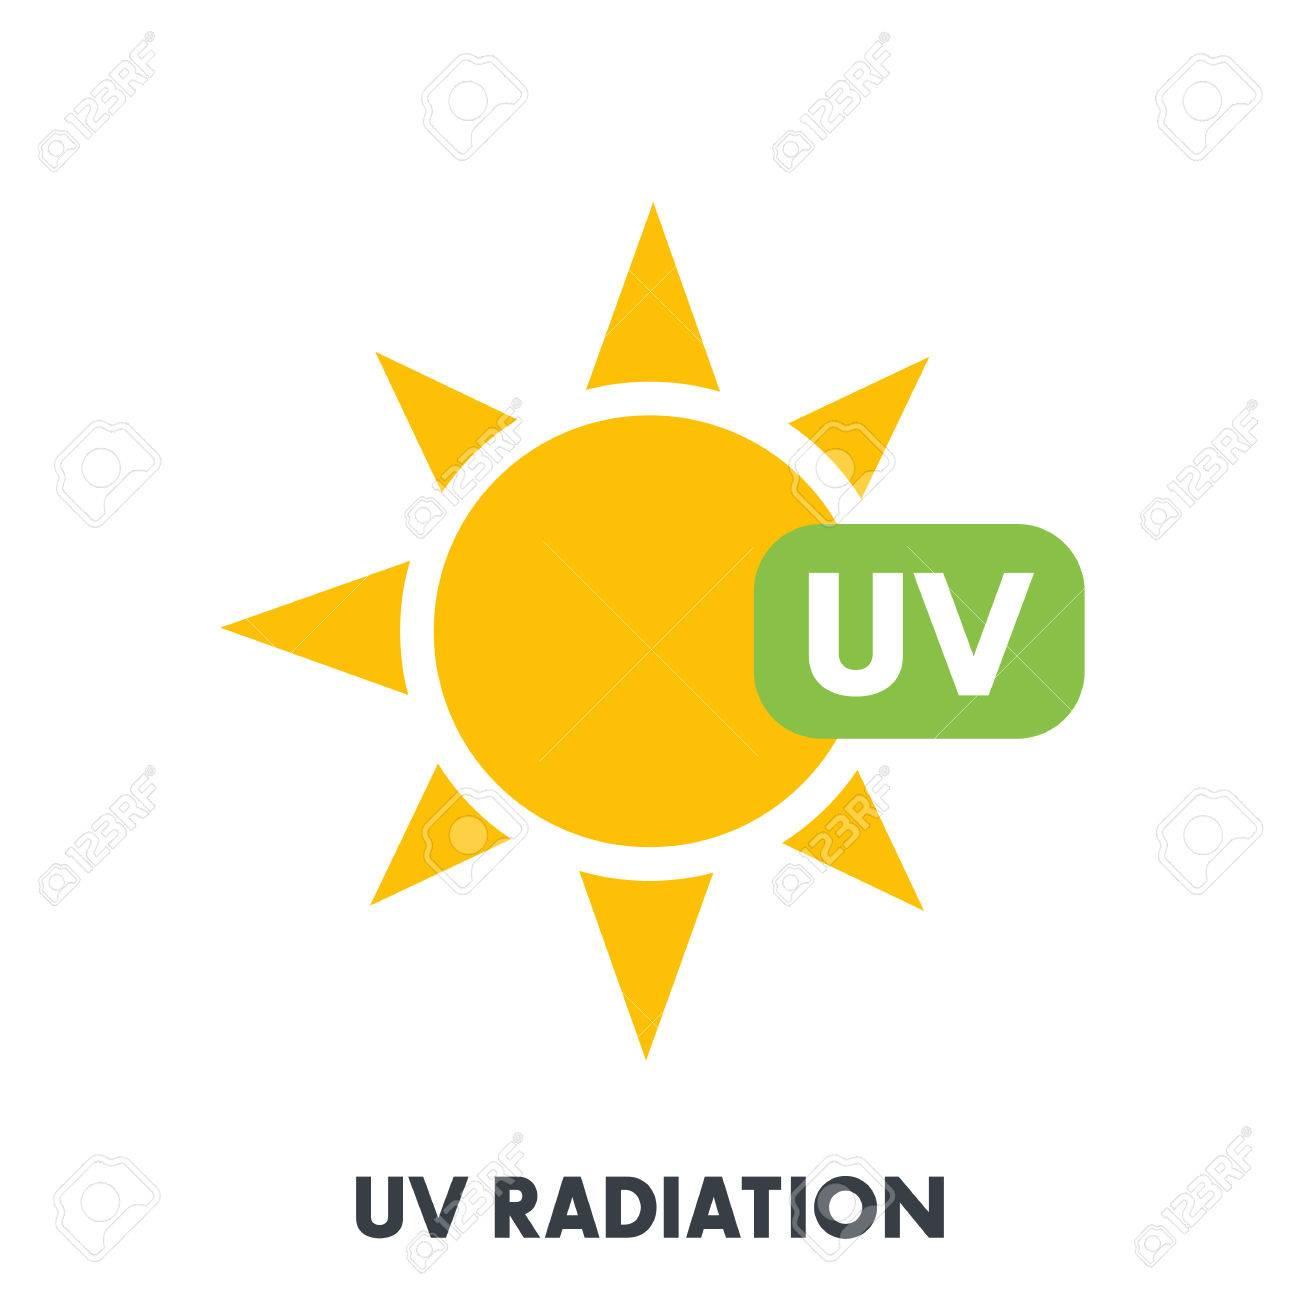 Radiation Solar Stock Illustrations – 3,656 Radiation Solar Stock  Illustrations, Vectors & Clipart - Dreamstime